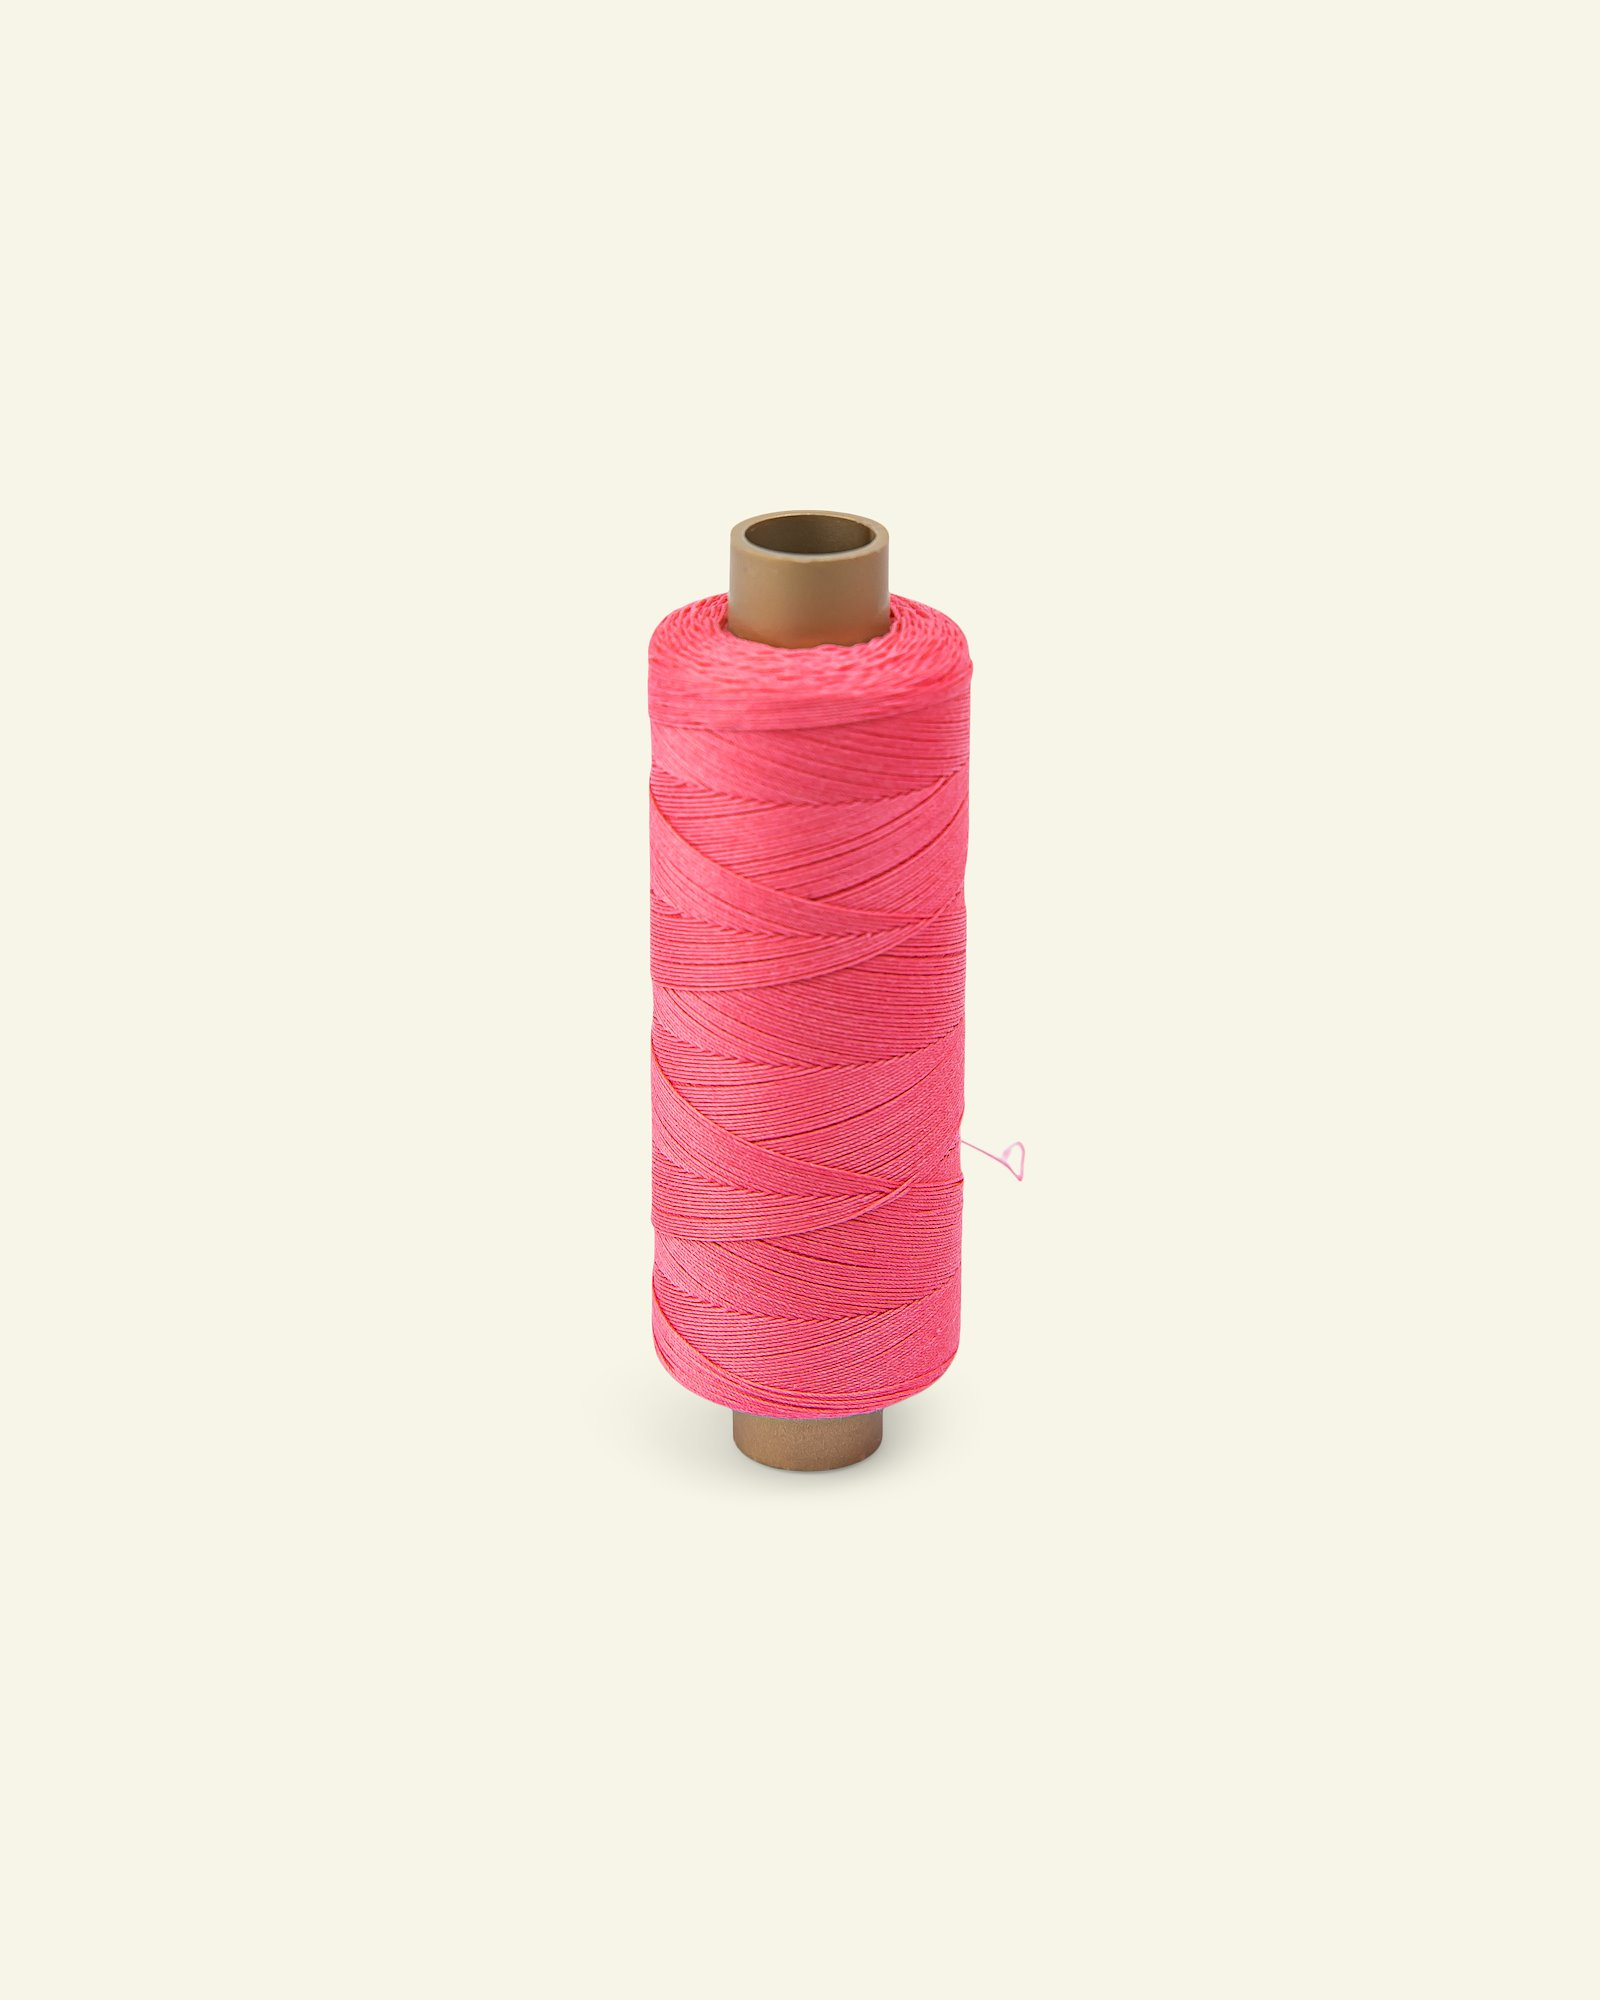 Quilting thread pink 300m